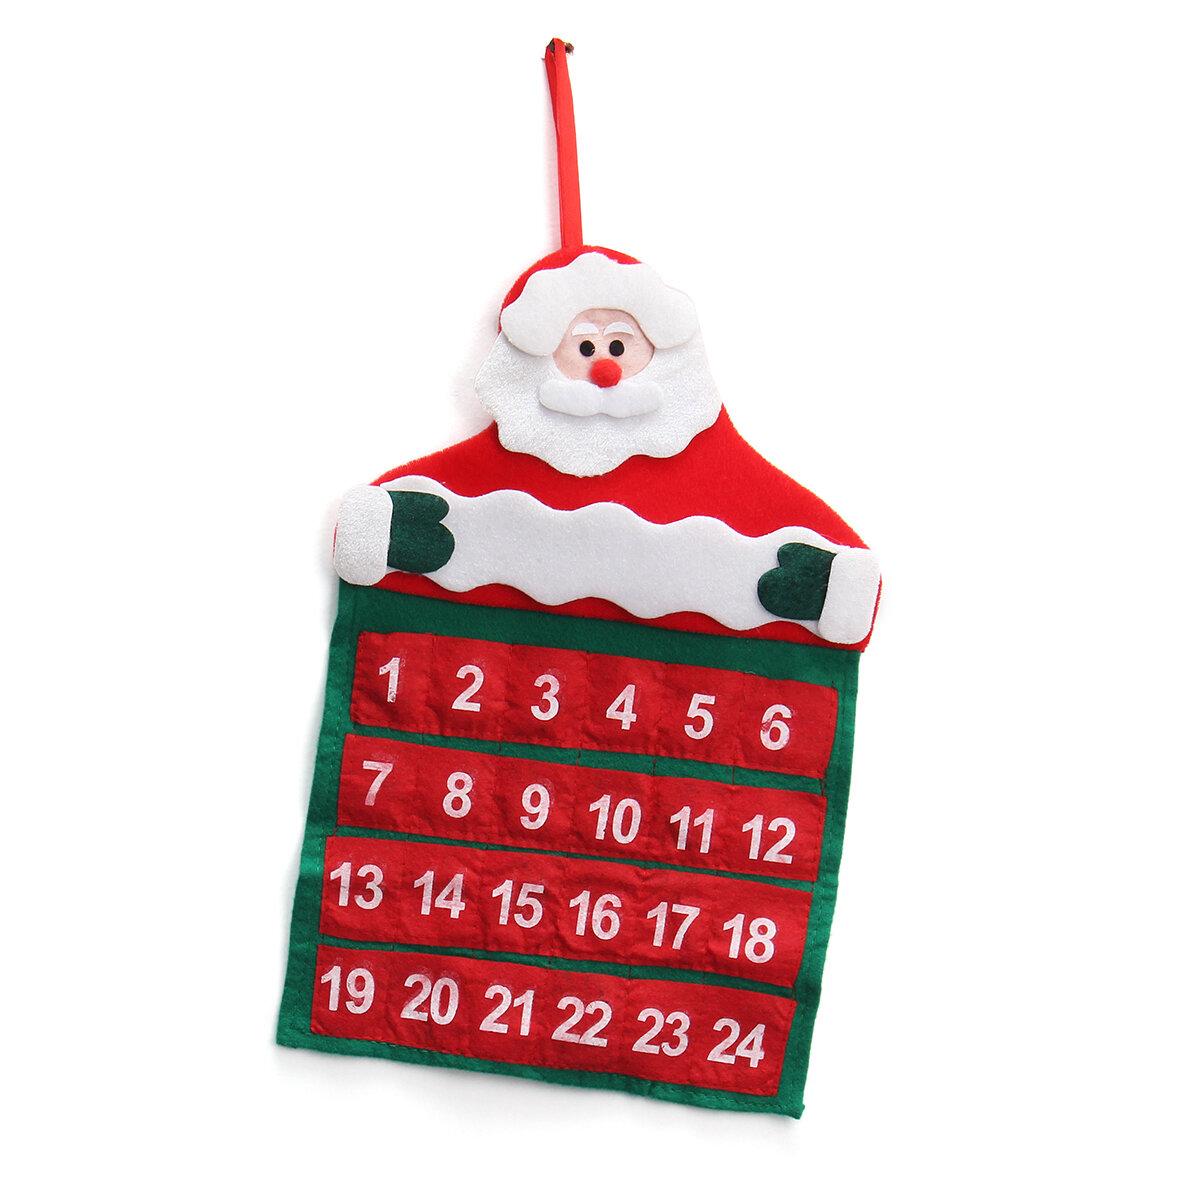 Felt Christmas Advent Wall Hanging Calendar Pockets Santa Reindeer Snowman Decorations